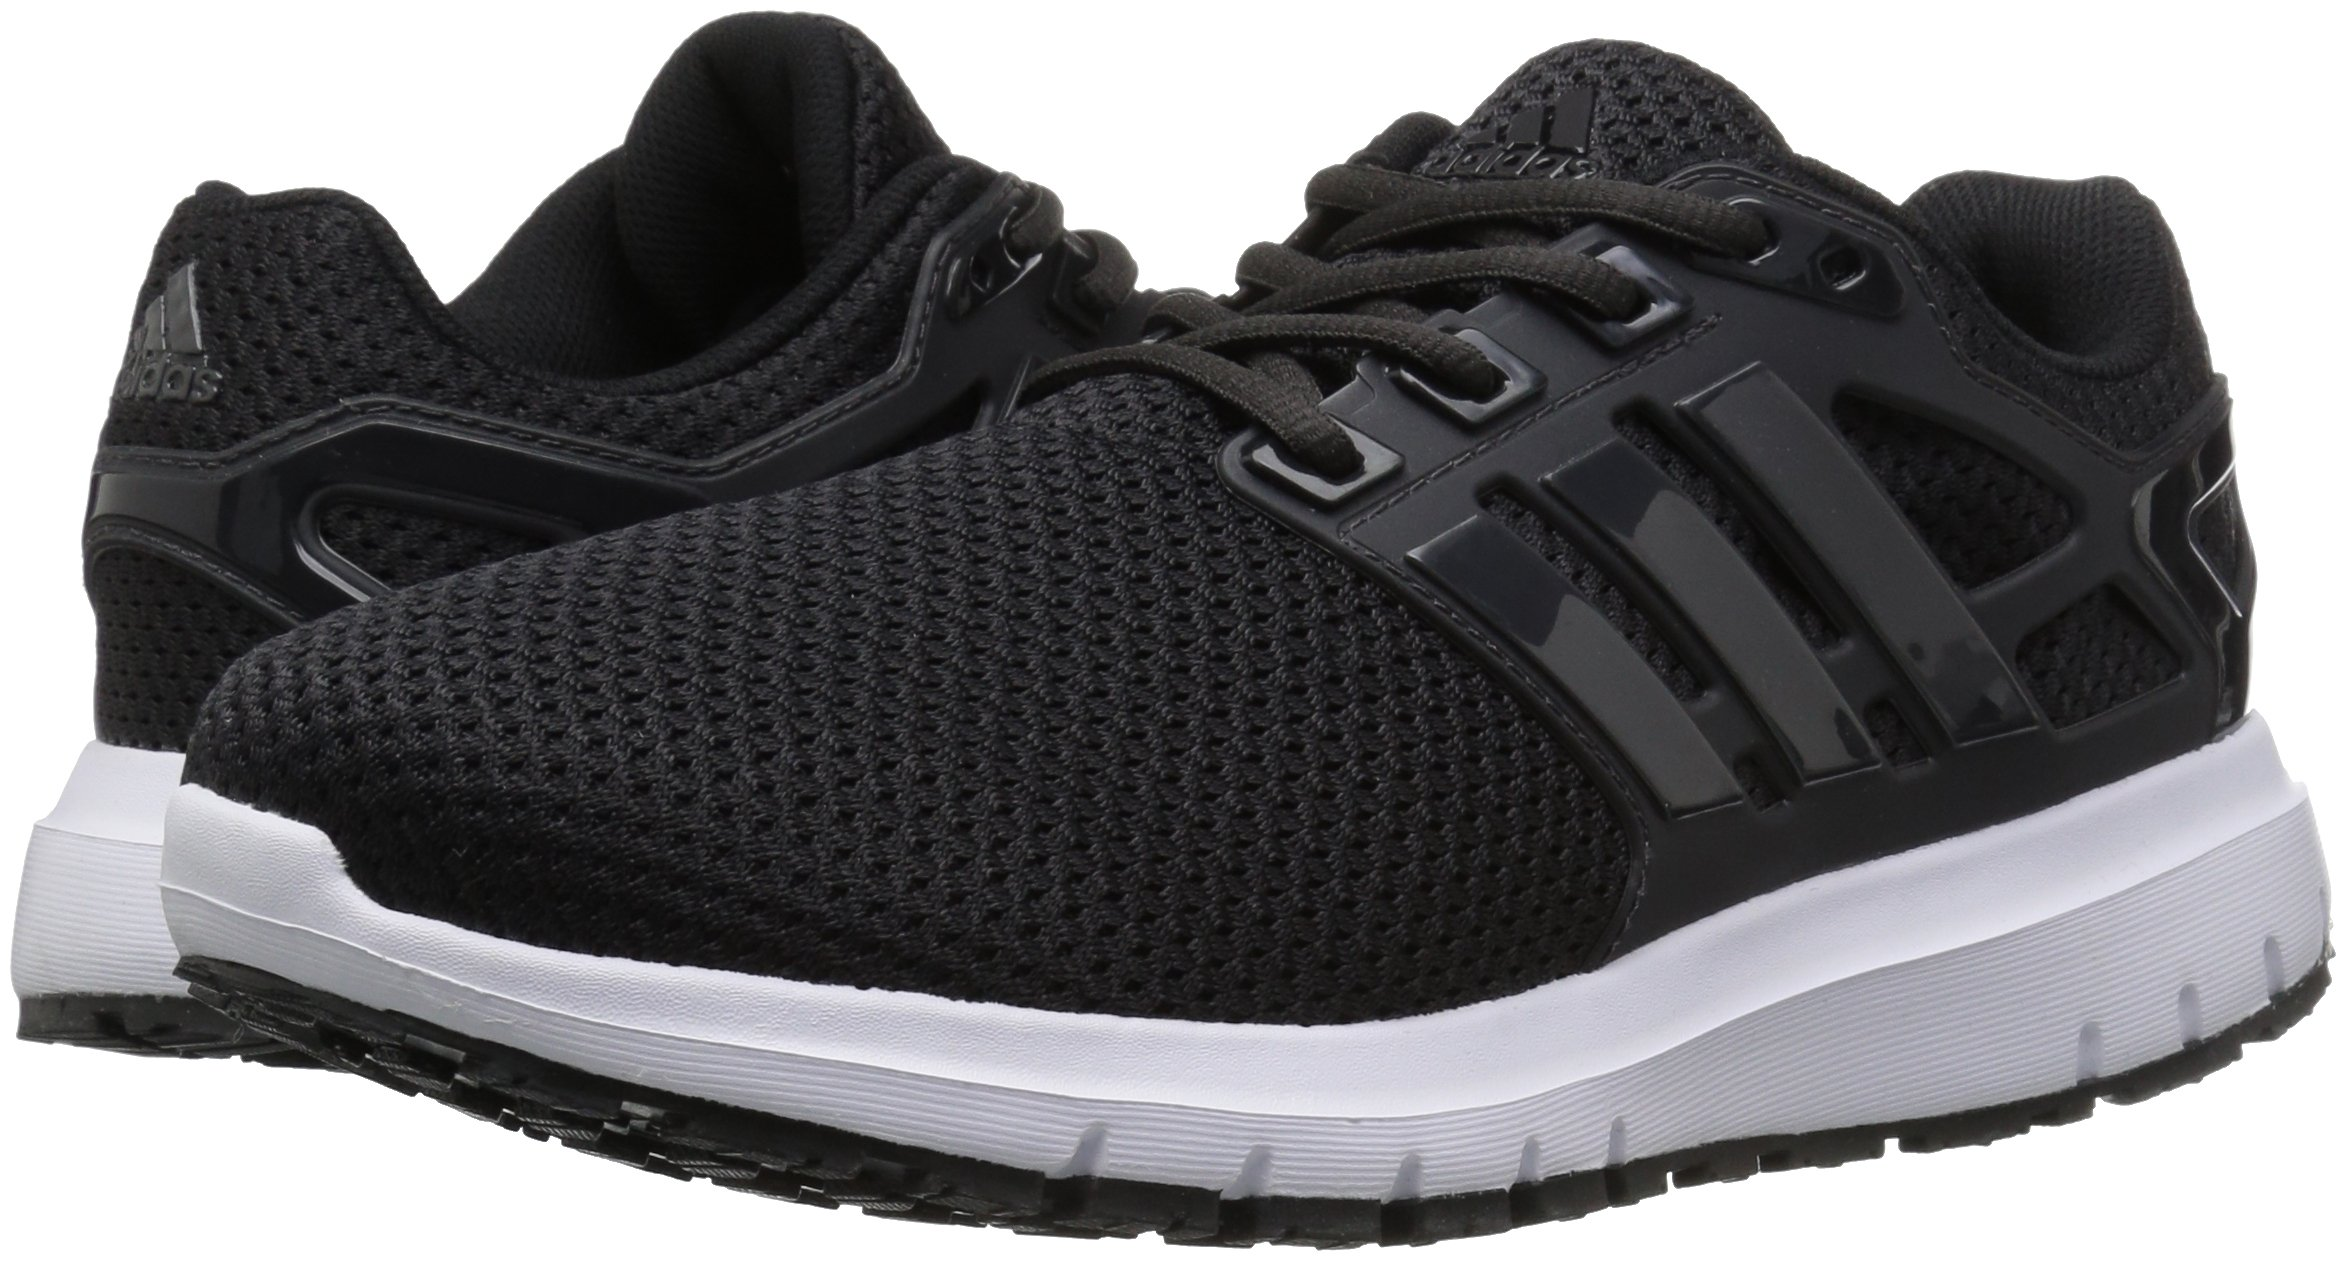 adidas  Men's Energy Cloud Wide m Running Shoe, BLACK/UTILITY BLACK/WHITE, 10.5 2E US by adidas (Image #6)